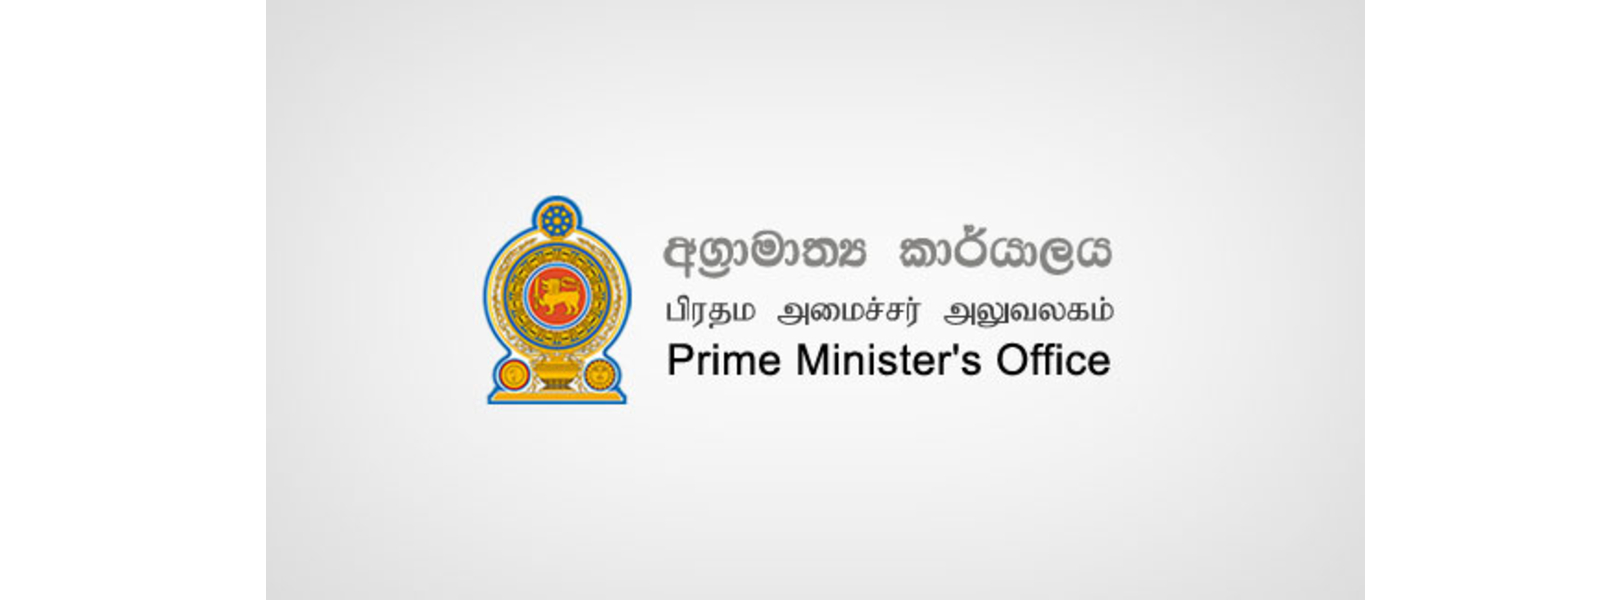 Prime Minister assures the public of adequate funds for Anti-Coronavirus Campaign